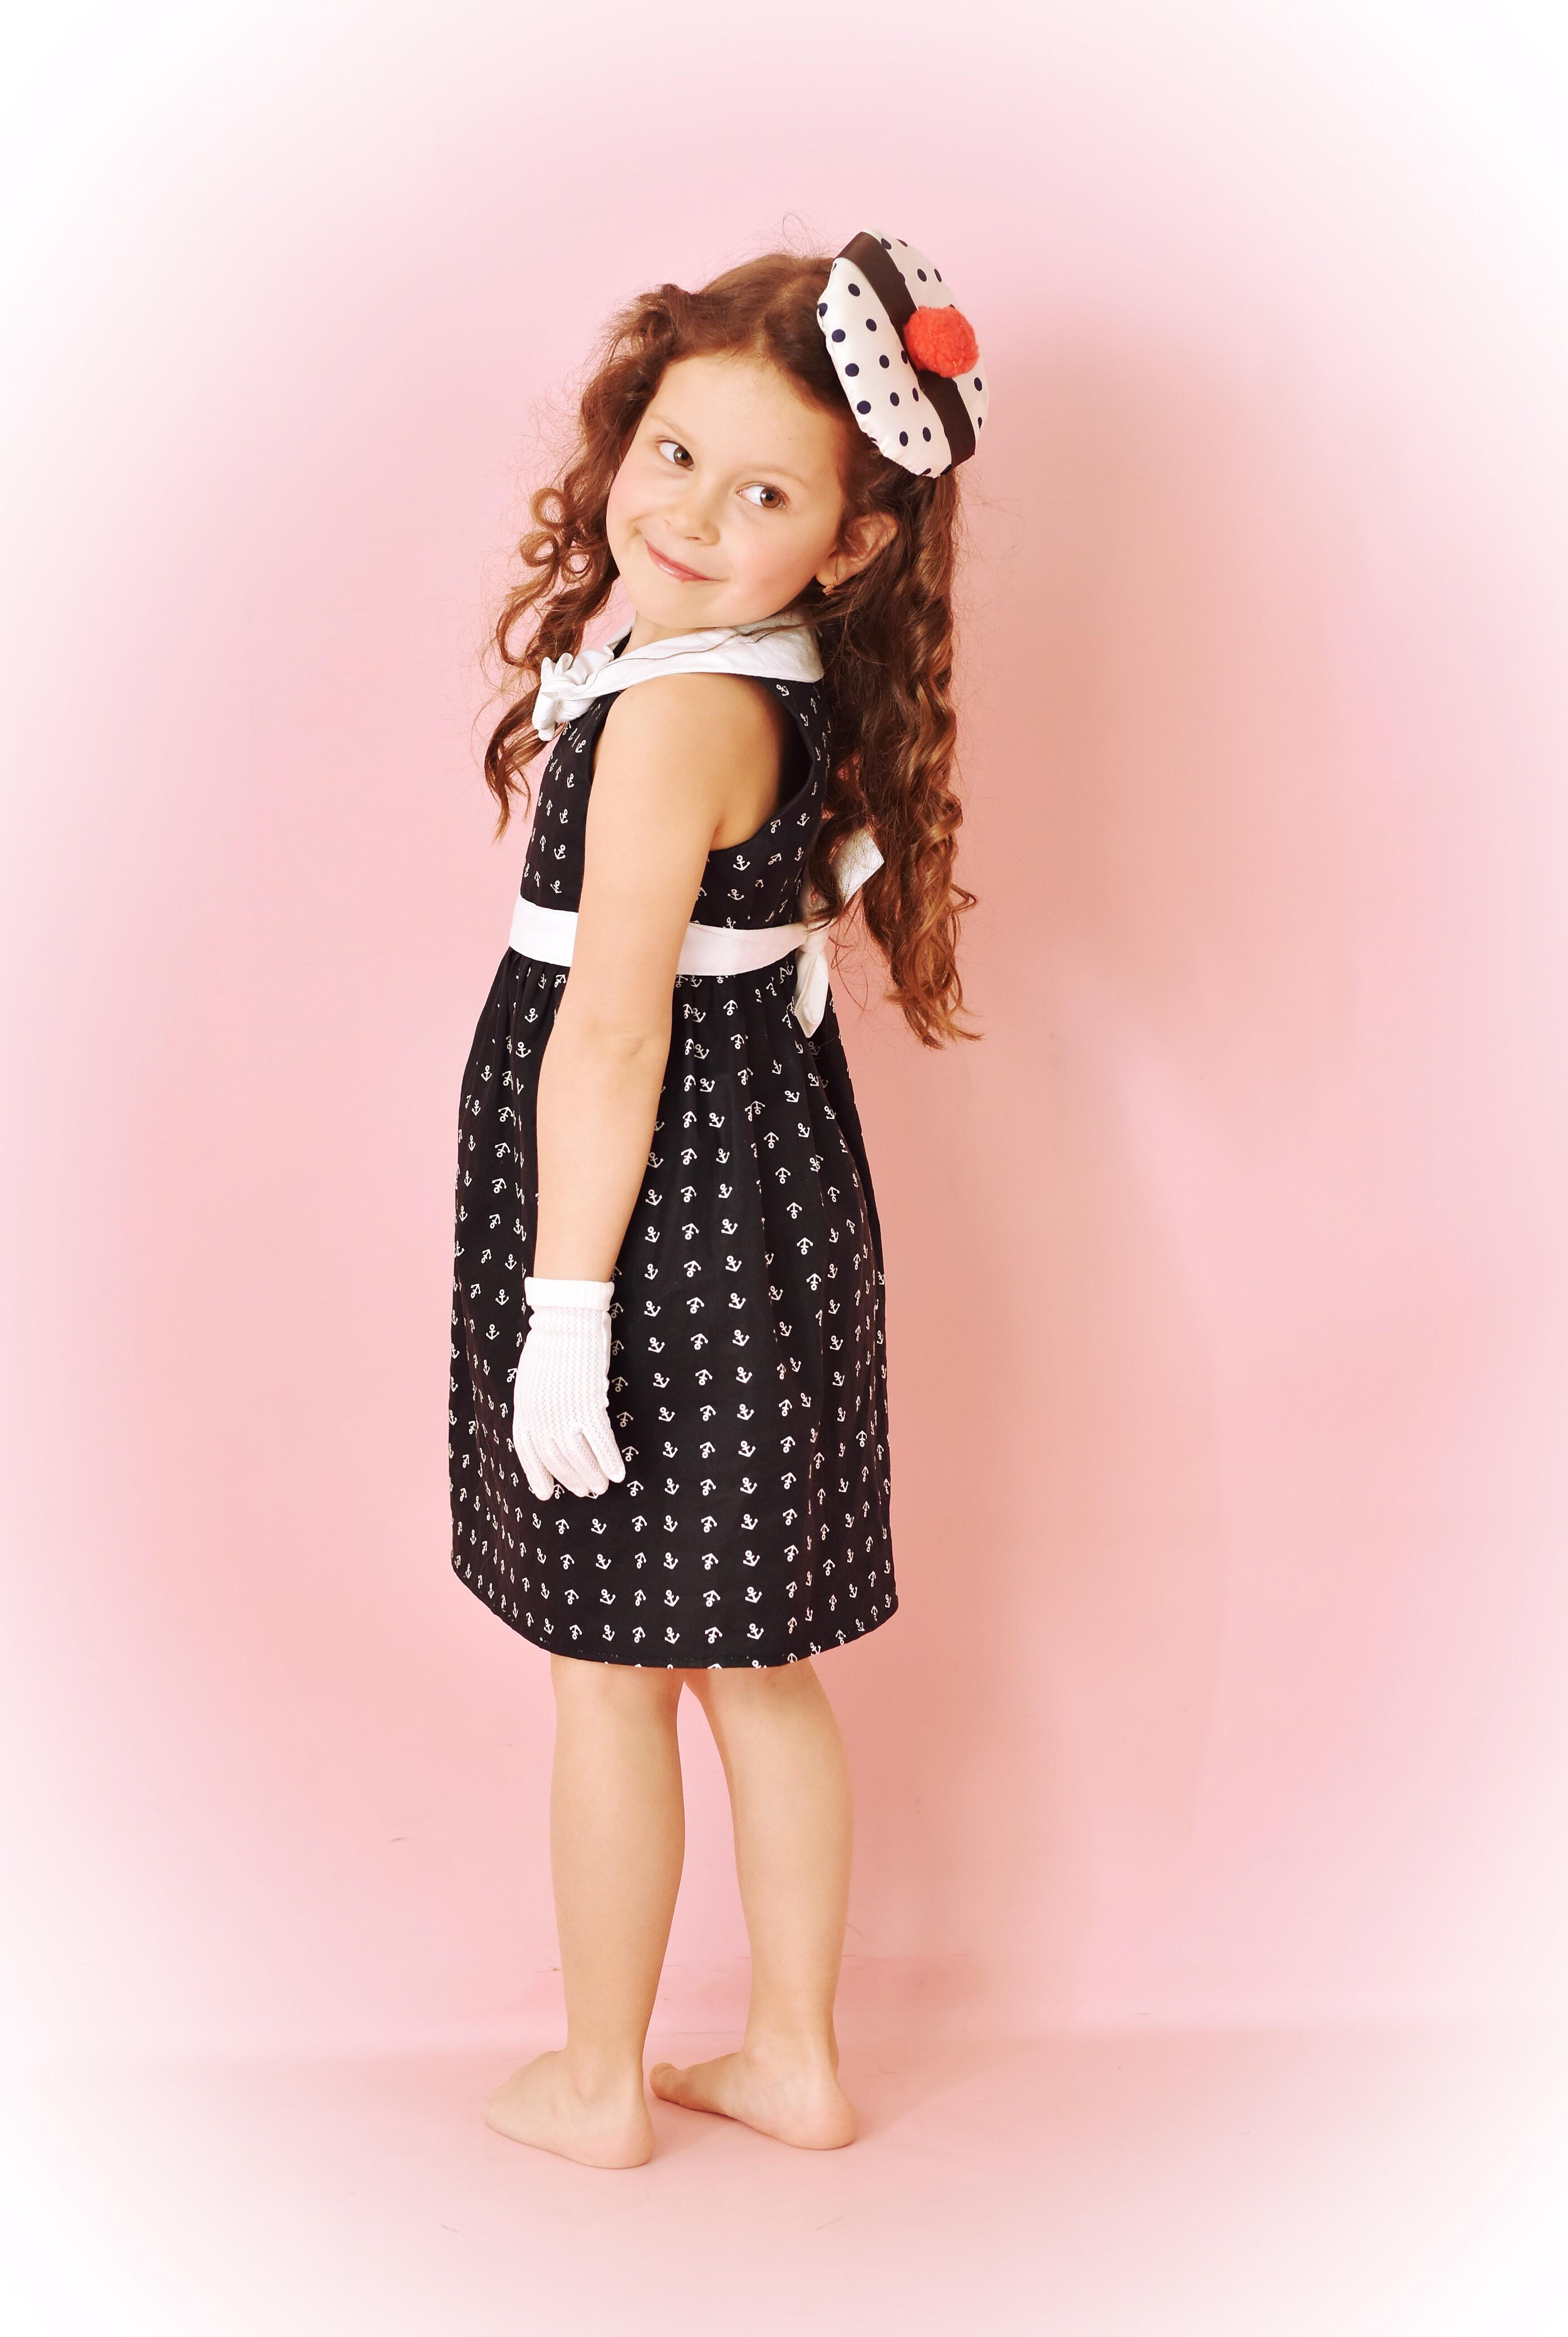 robe vintage marinette t3 t6 ans au rendez vous des pin up. Black Bedroom Furniture Sets. Home Design Ideas